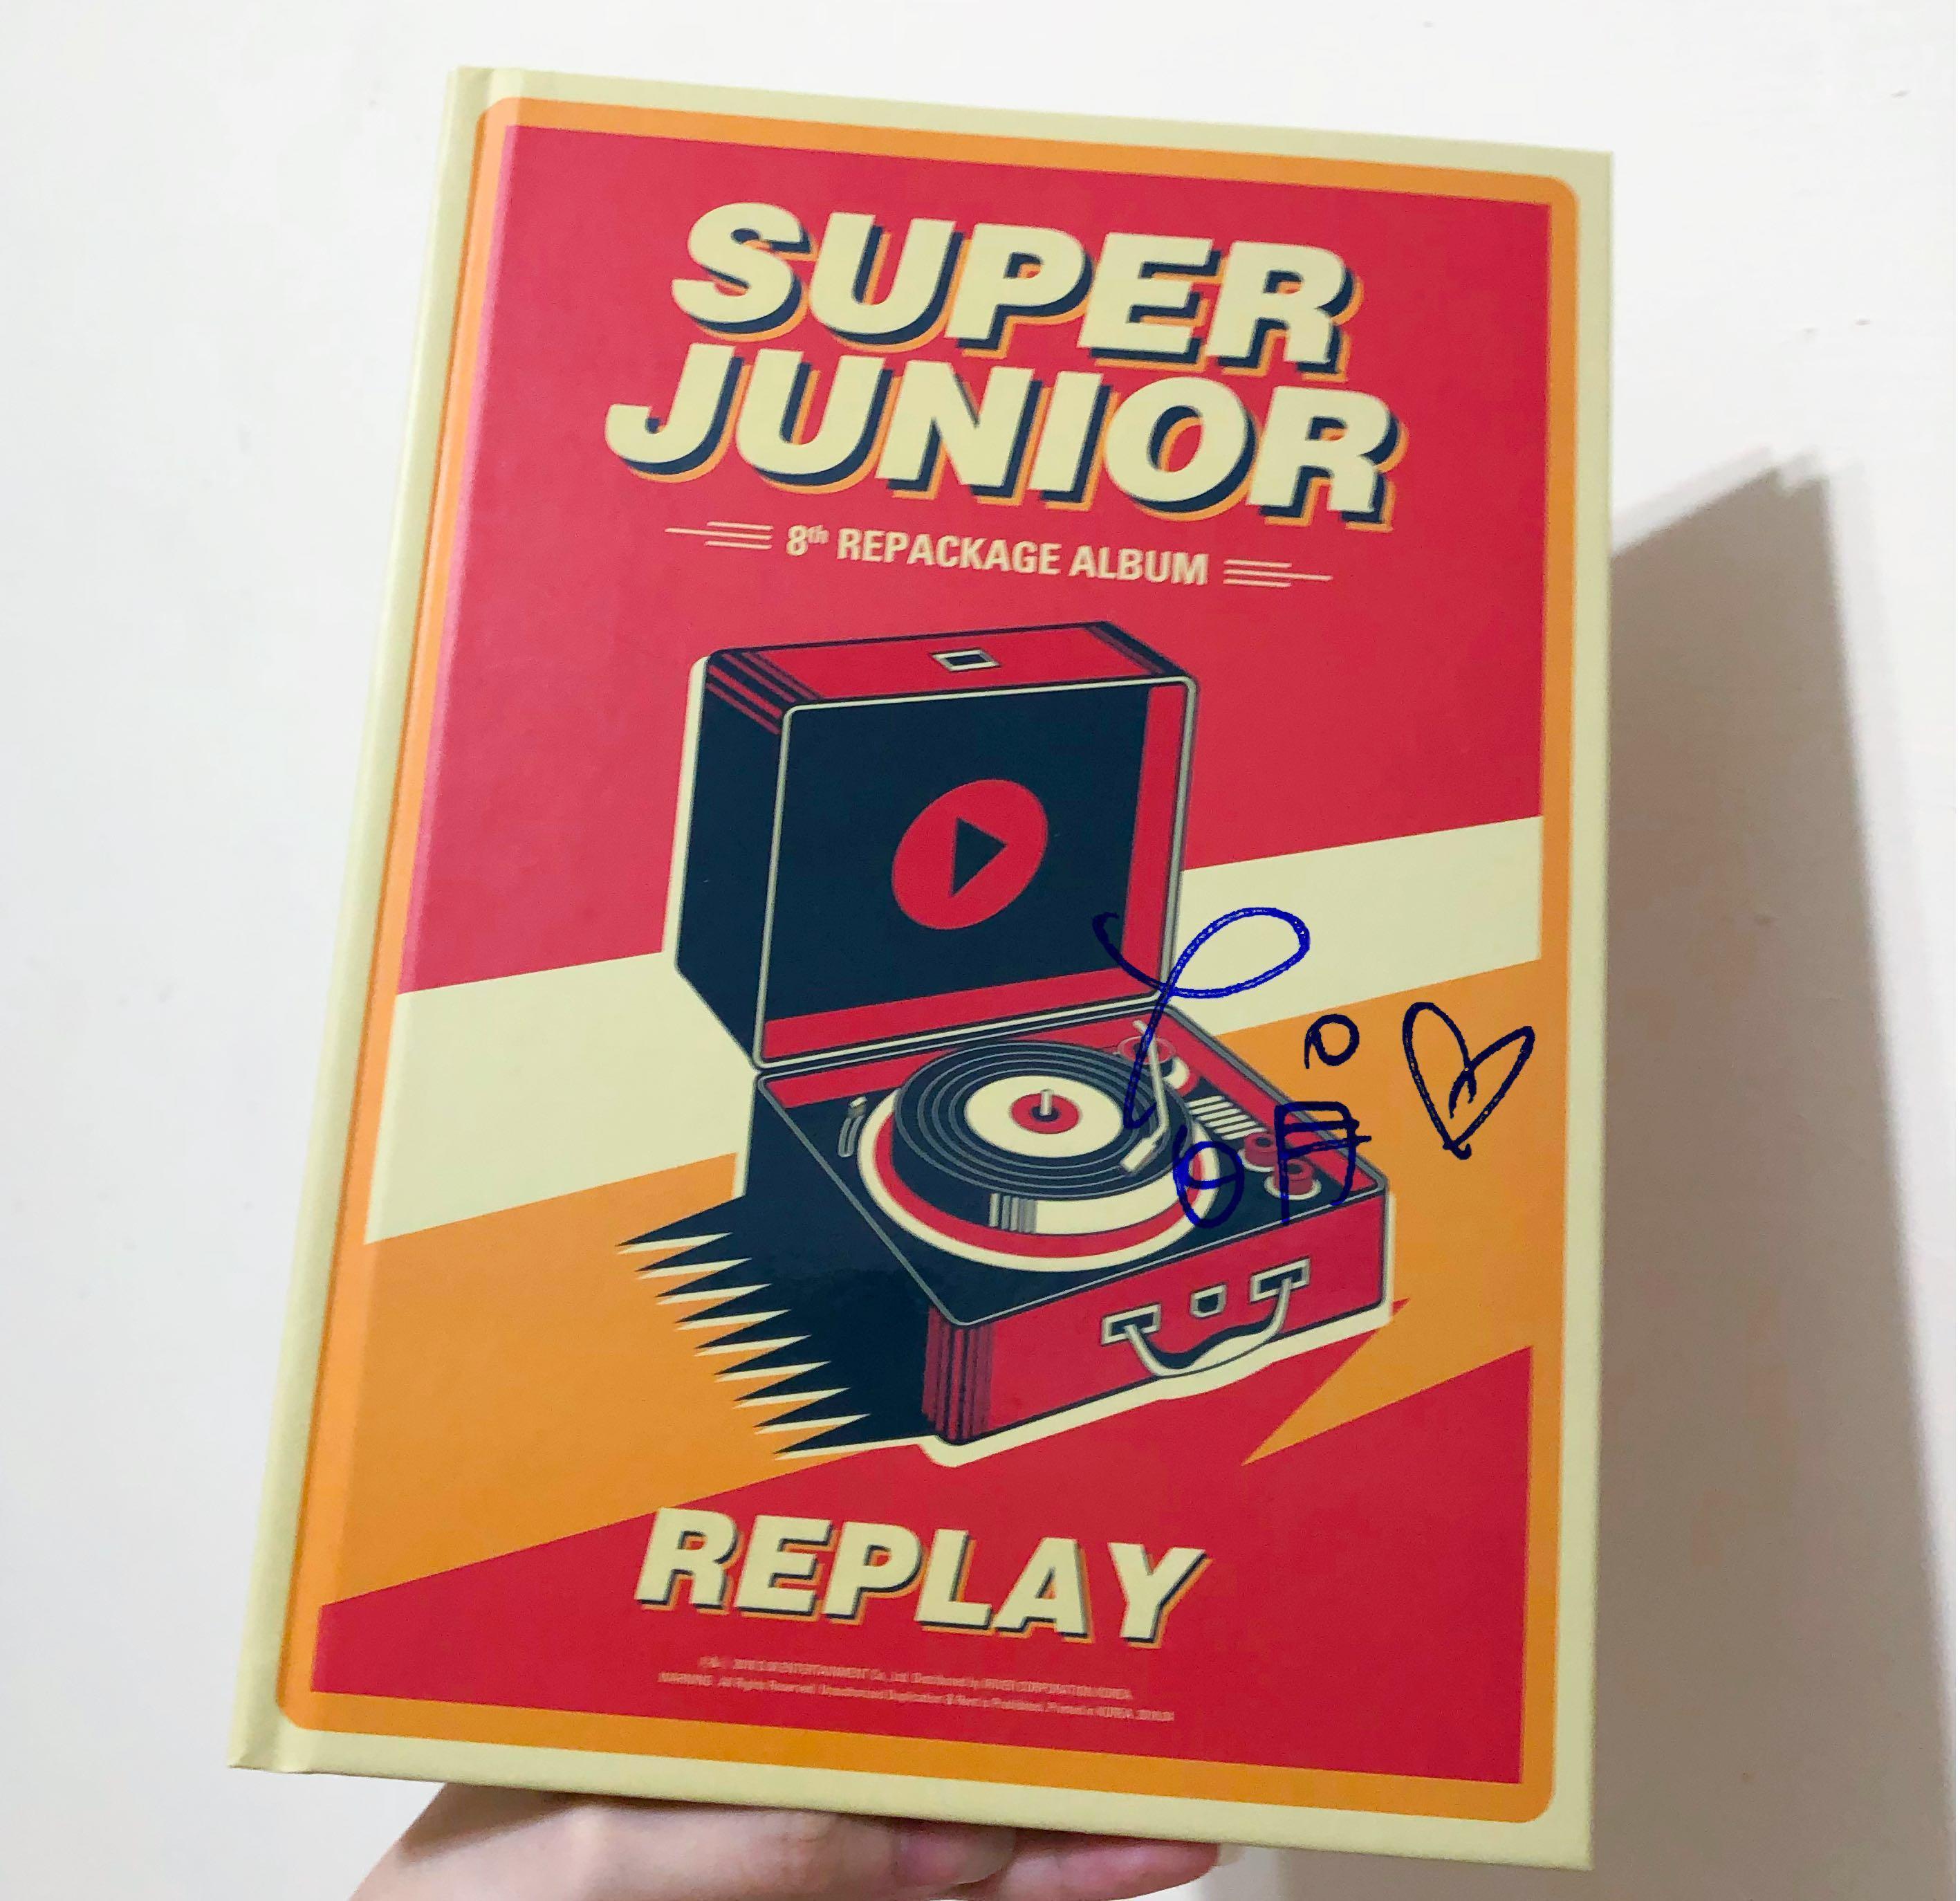 SUPER JUNIOR八輯改版 'REPLAY'普通版 限量版 空專 拆專